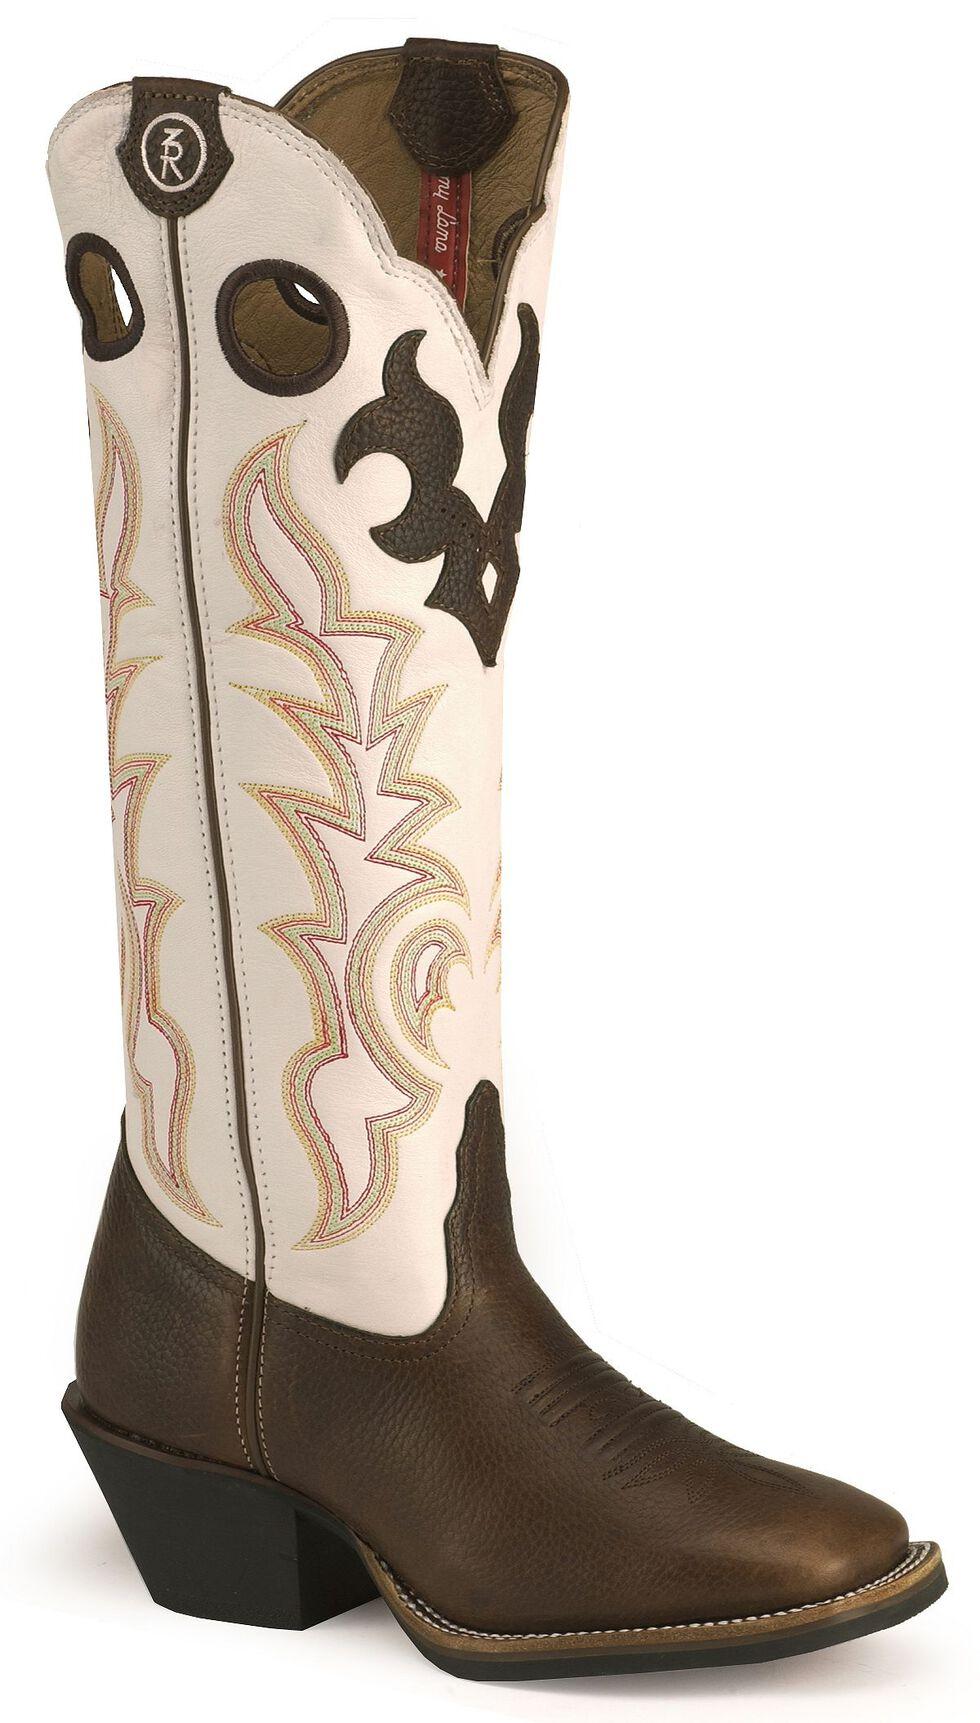 Tony Lama 3R Series Buckaroo Boots - Square Toe, Dark Brown, hi-res